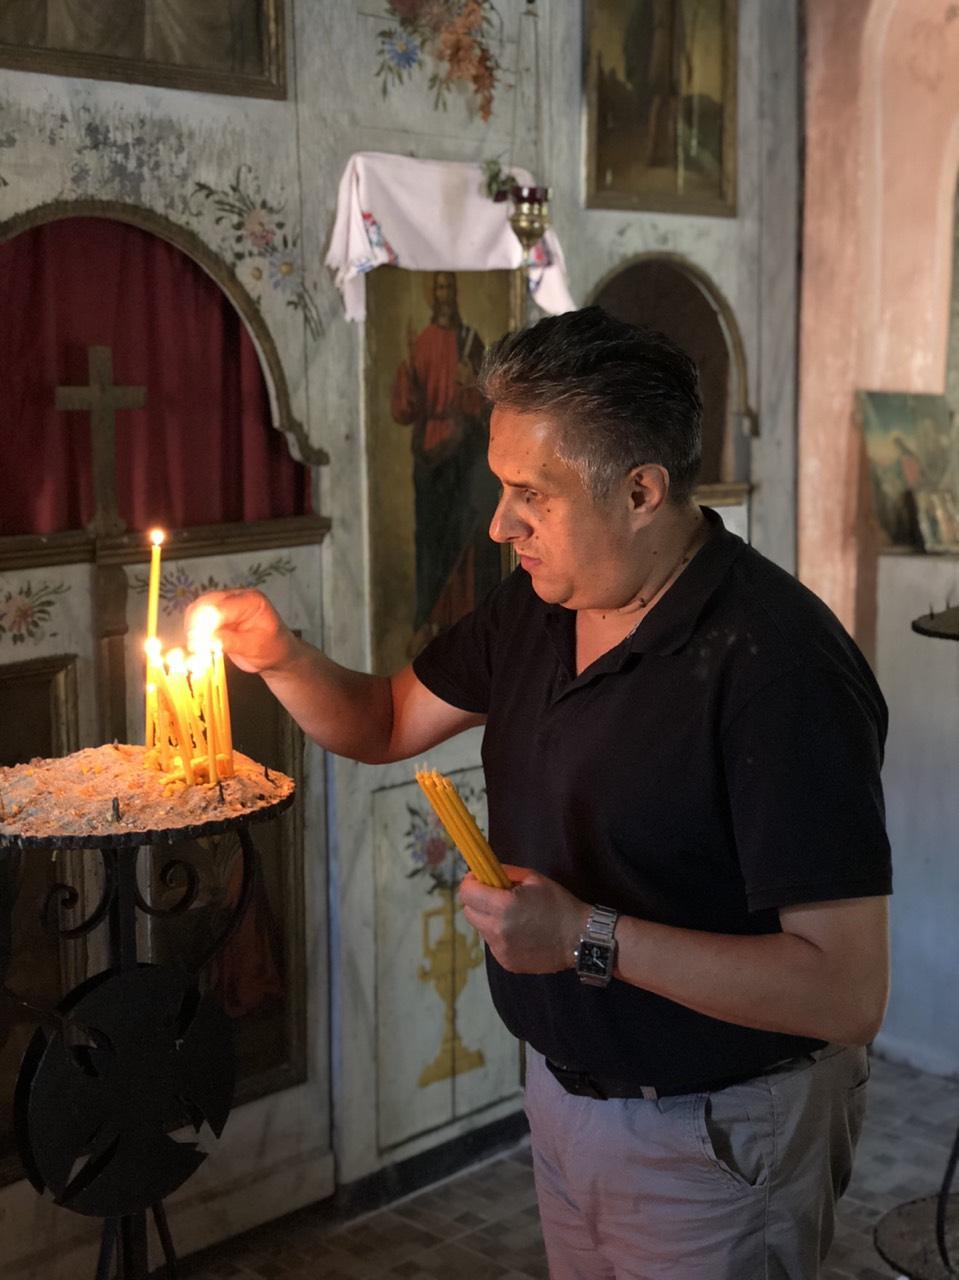 Miletić domaćinima čestitao letnjeg Svetog Nikolu